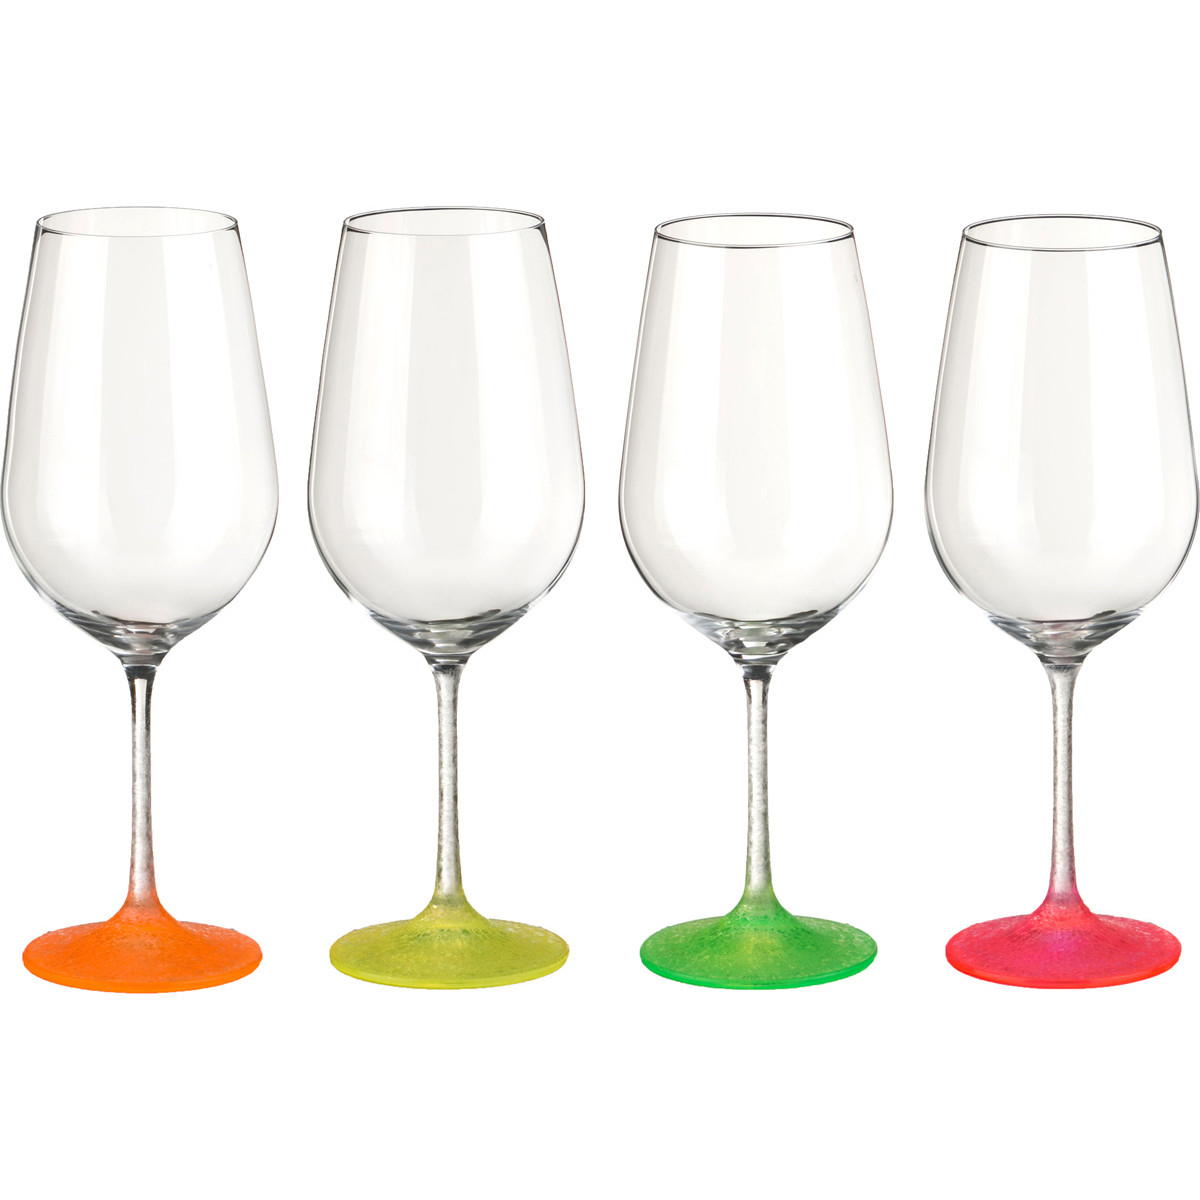 {} Bohemia Crystal Набор бокалов для вина Angelina (550 мл - 4 шт) bohemia crystal набор бокалов для шампанского felina 25 см 2 шт